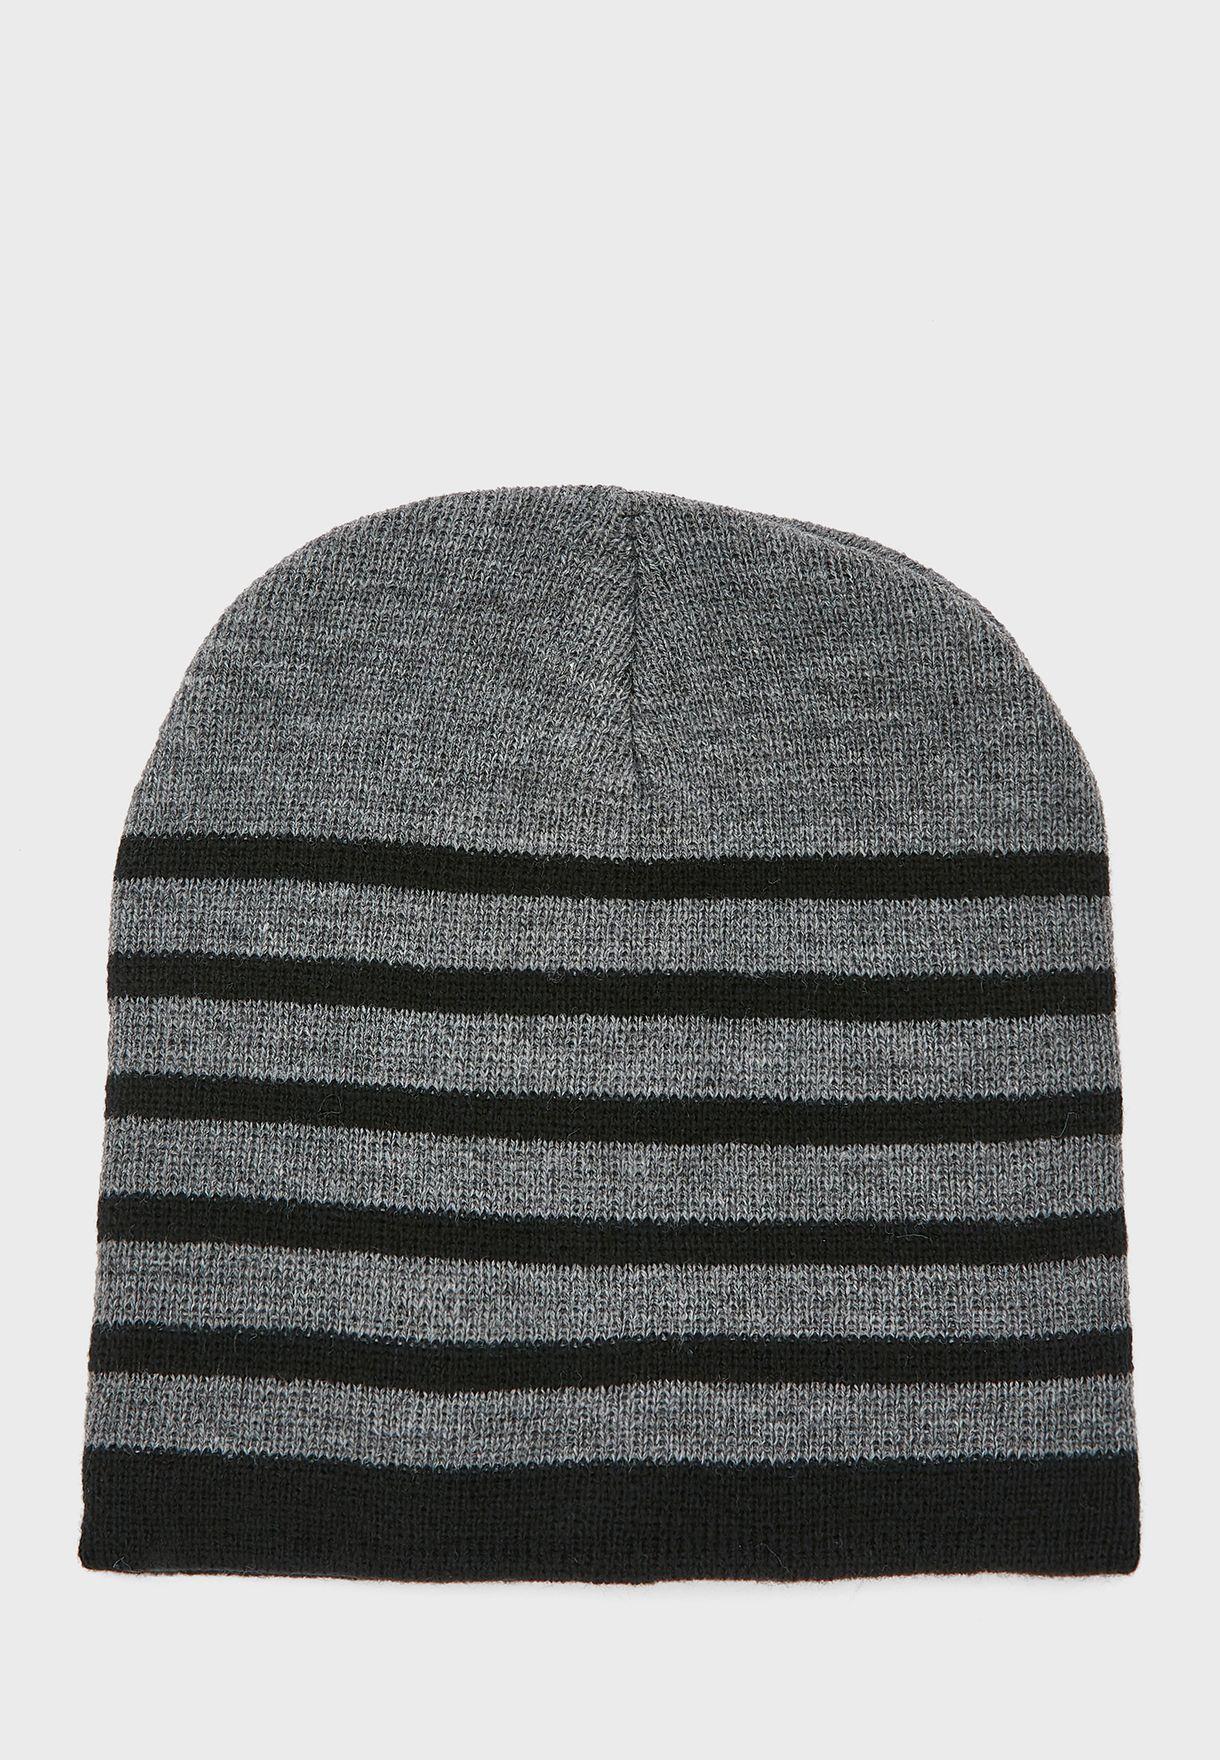 MENS STRIPED BEANIE HAT